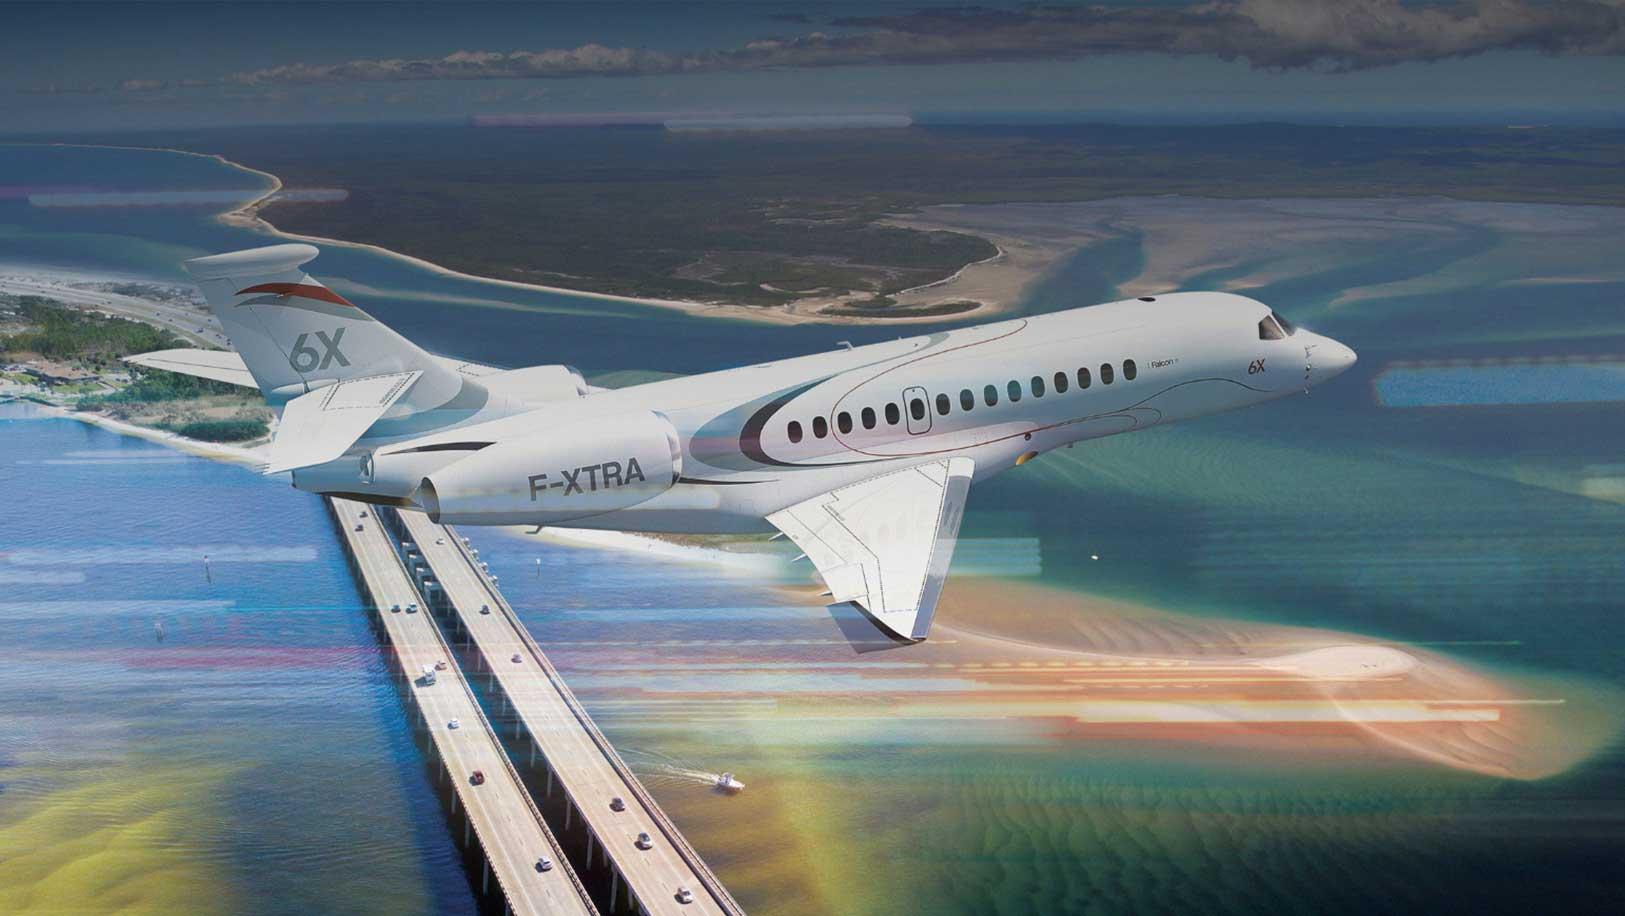 Dassault Falcon.jpg